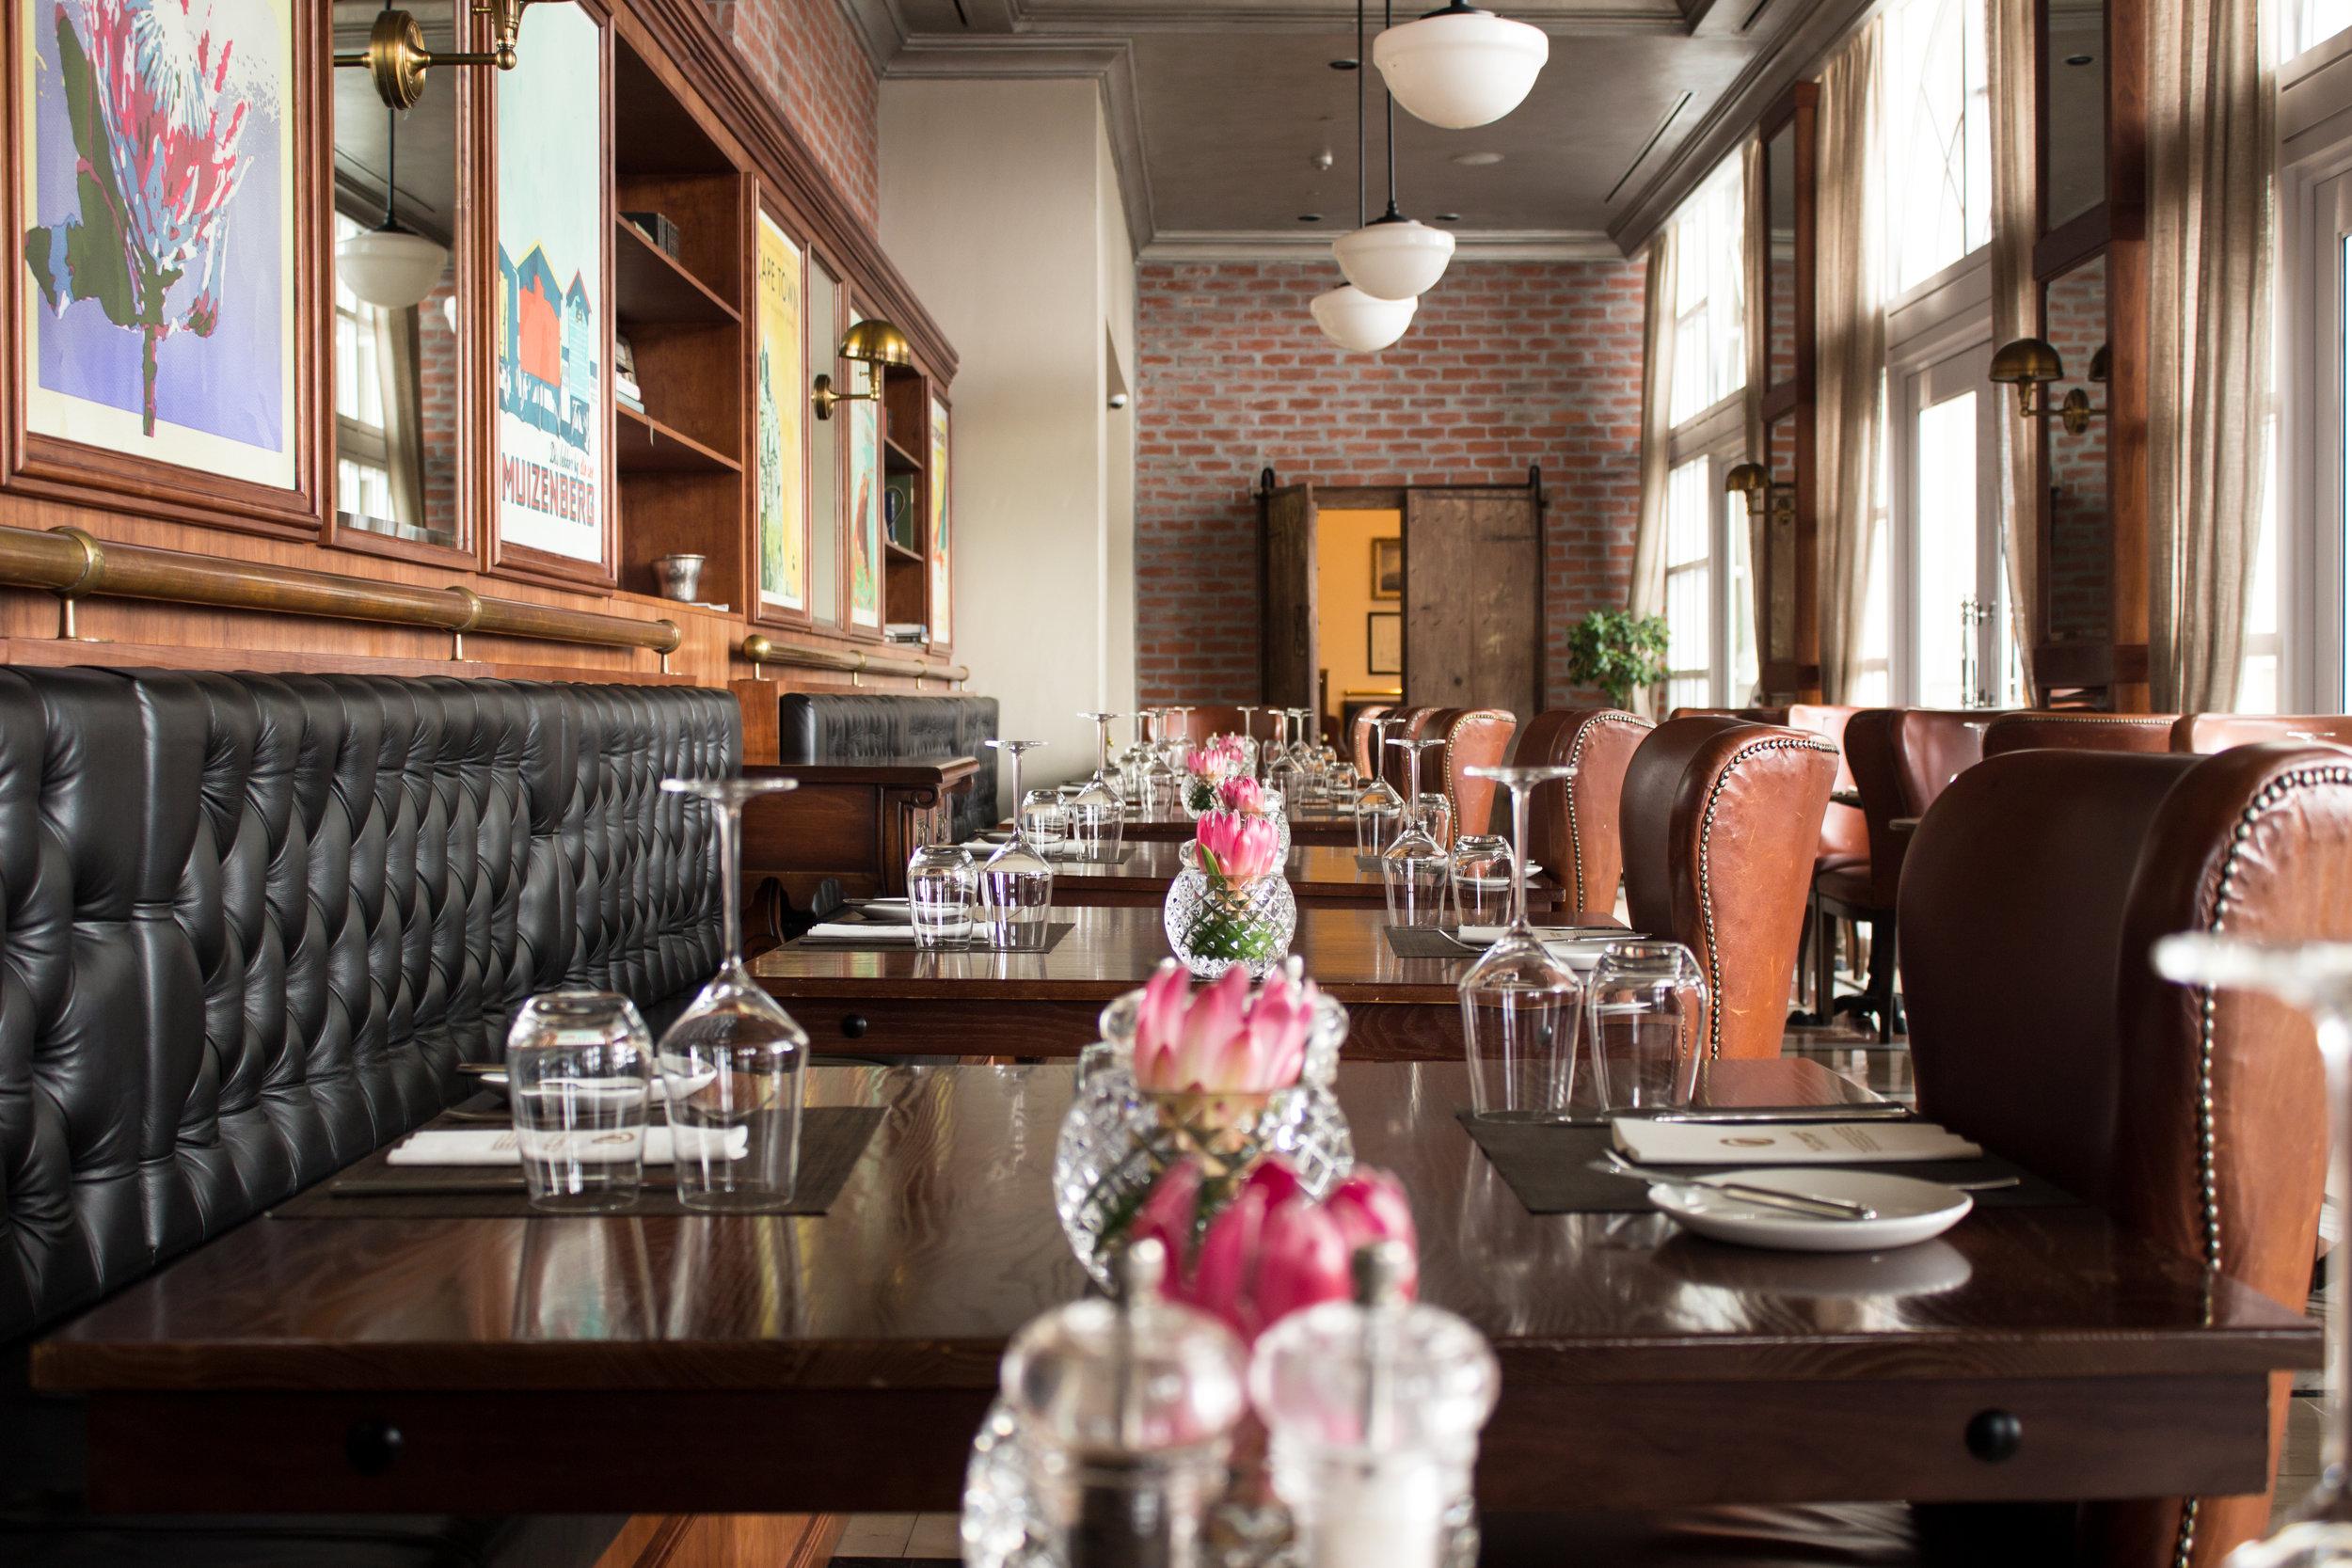 Restaurants - Fast Food Restaurants, Casual DiningLearn More